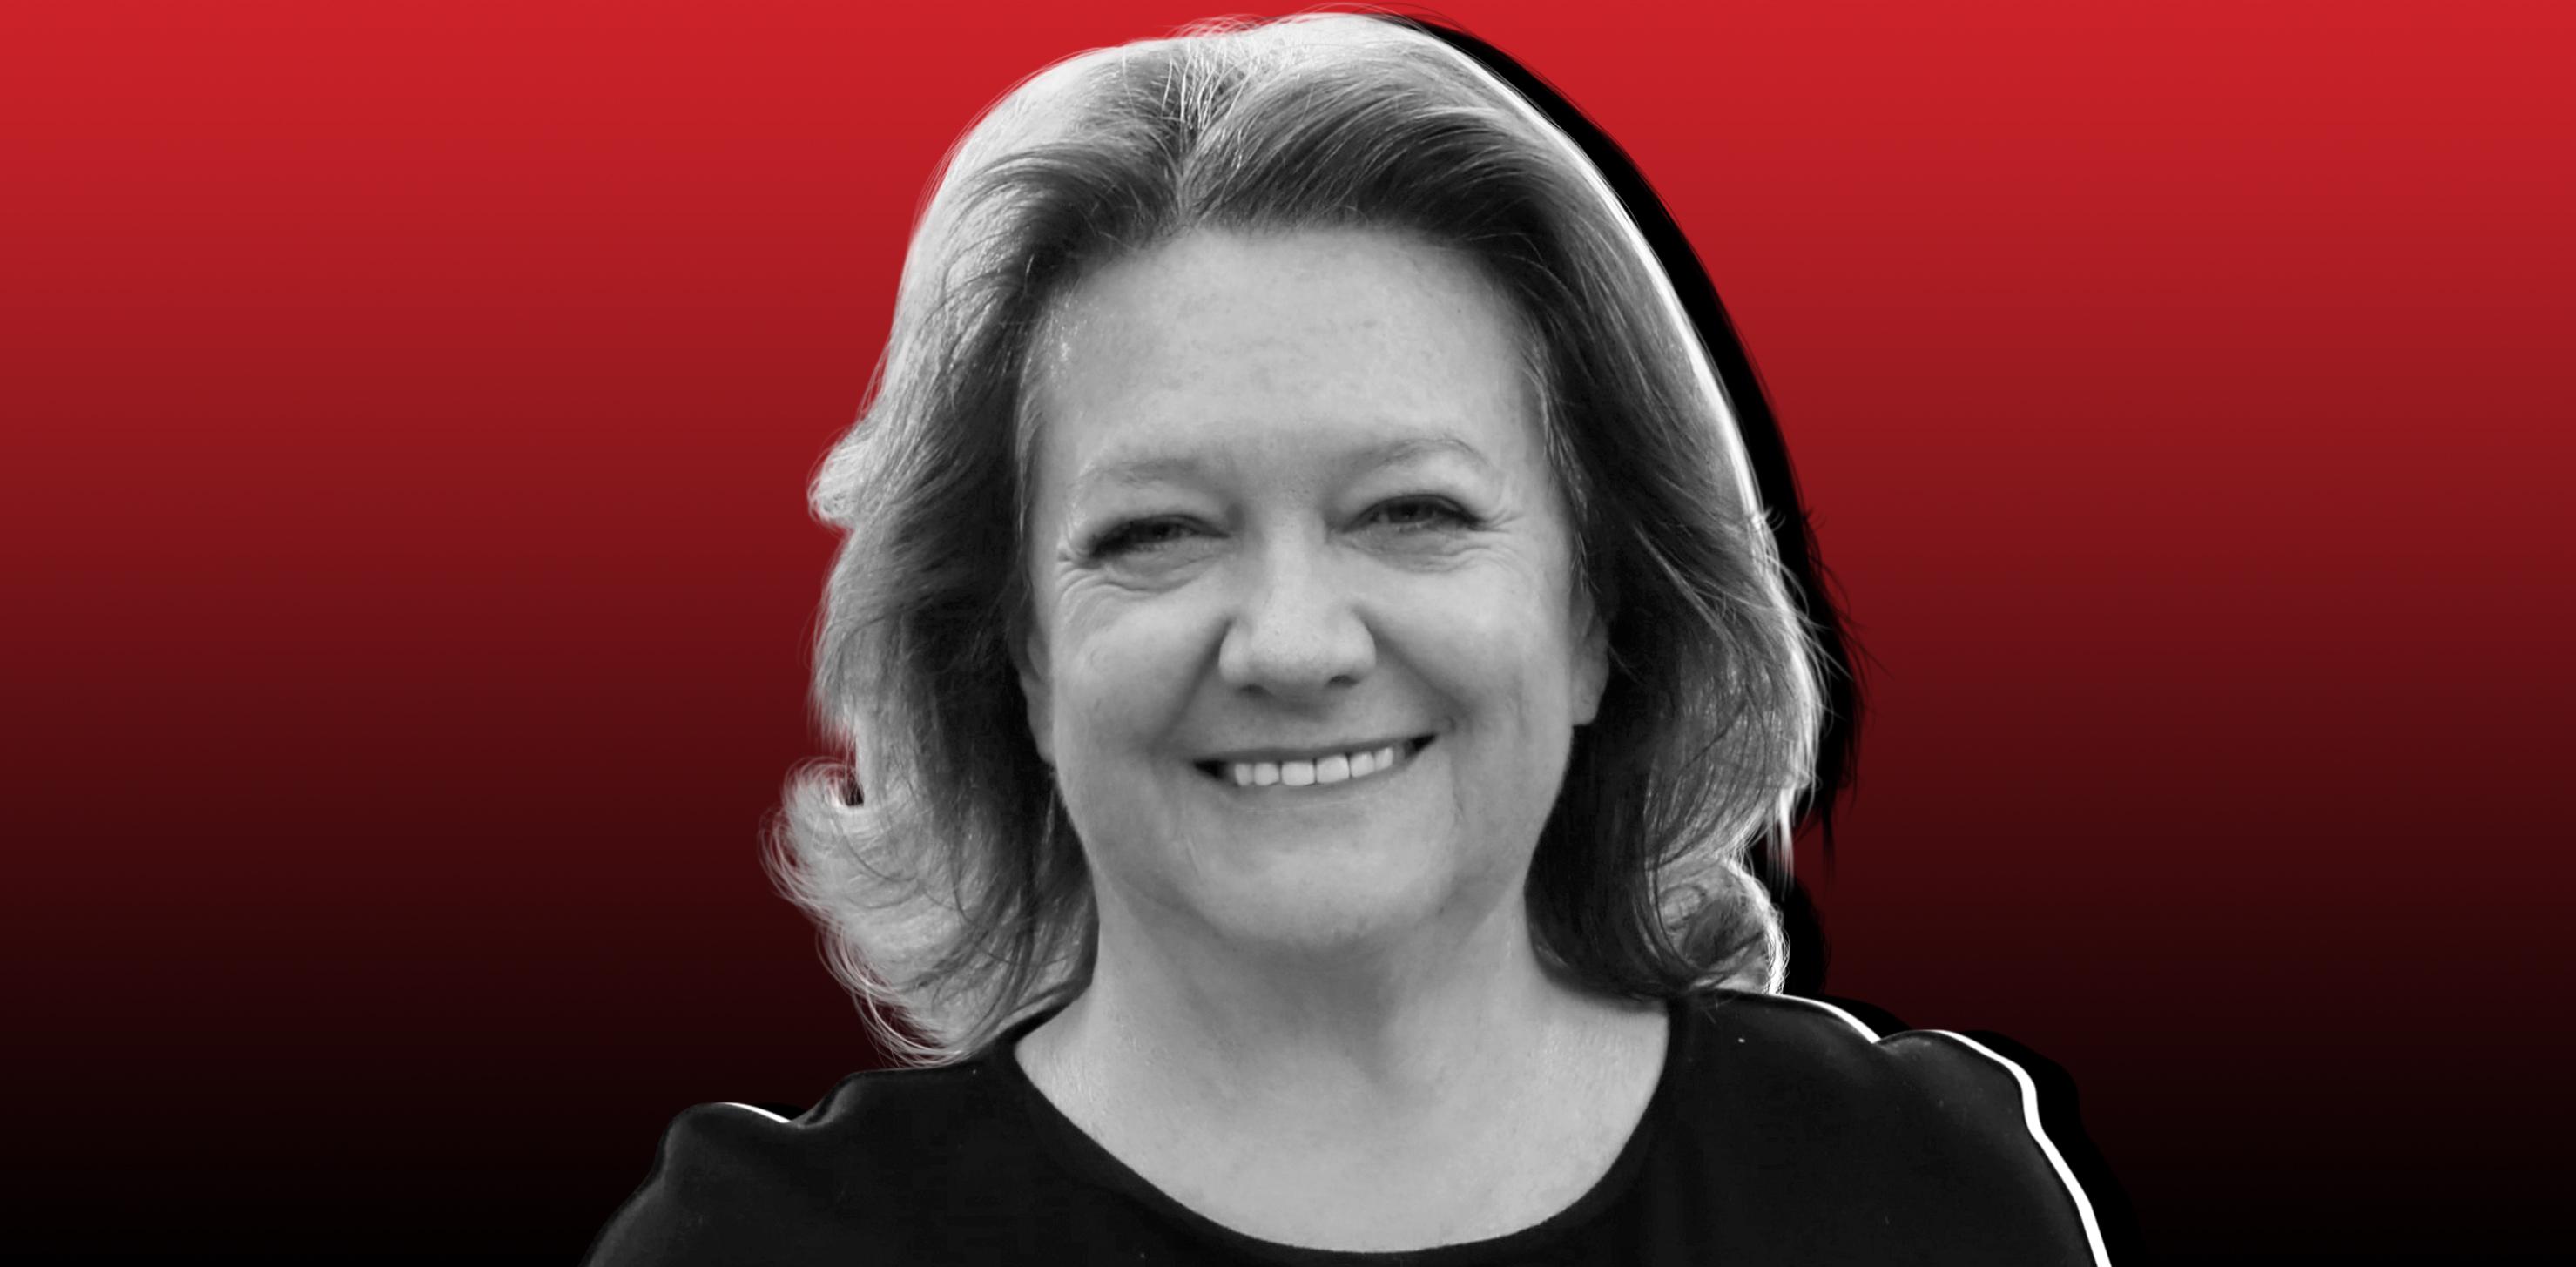 IMPW 2019. 43. Gina Rinehart